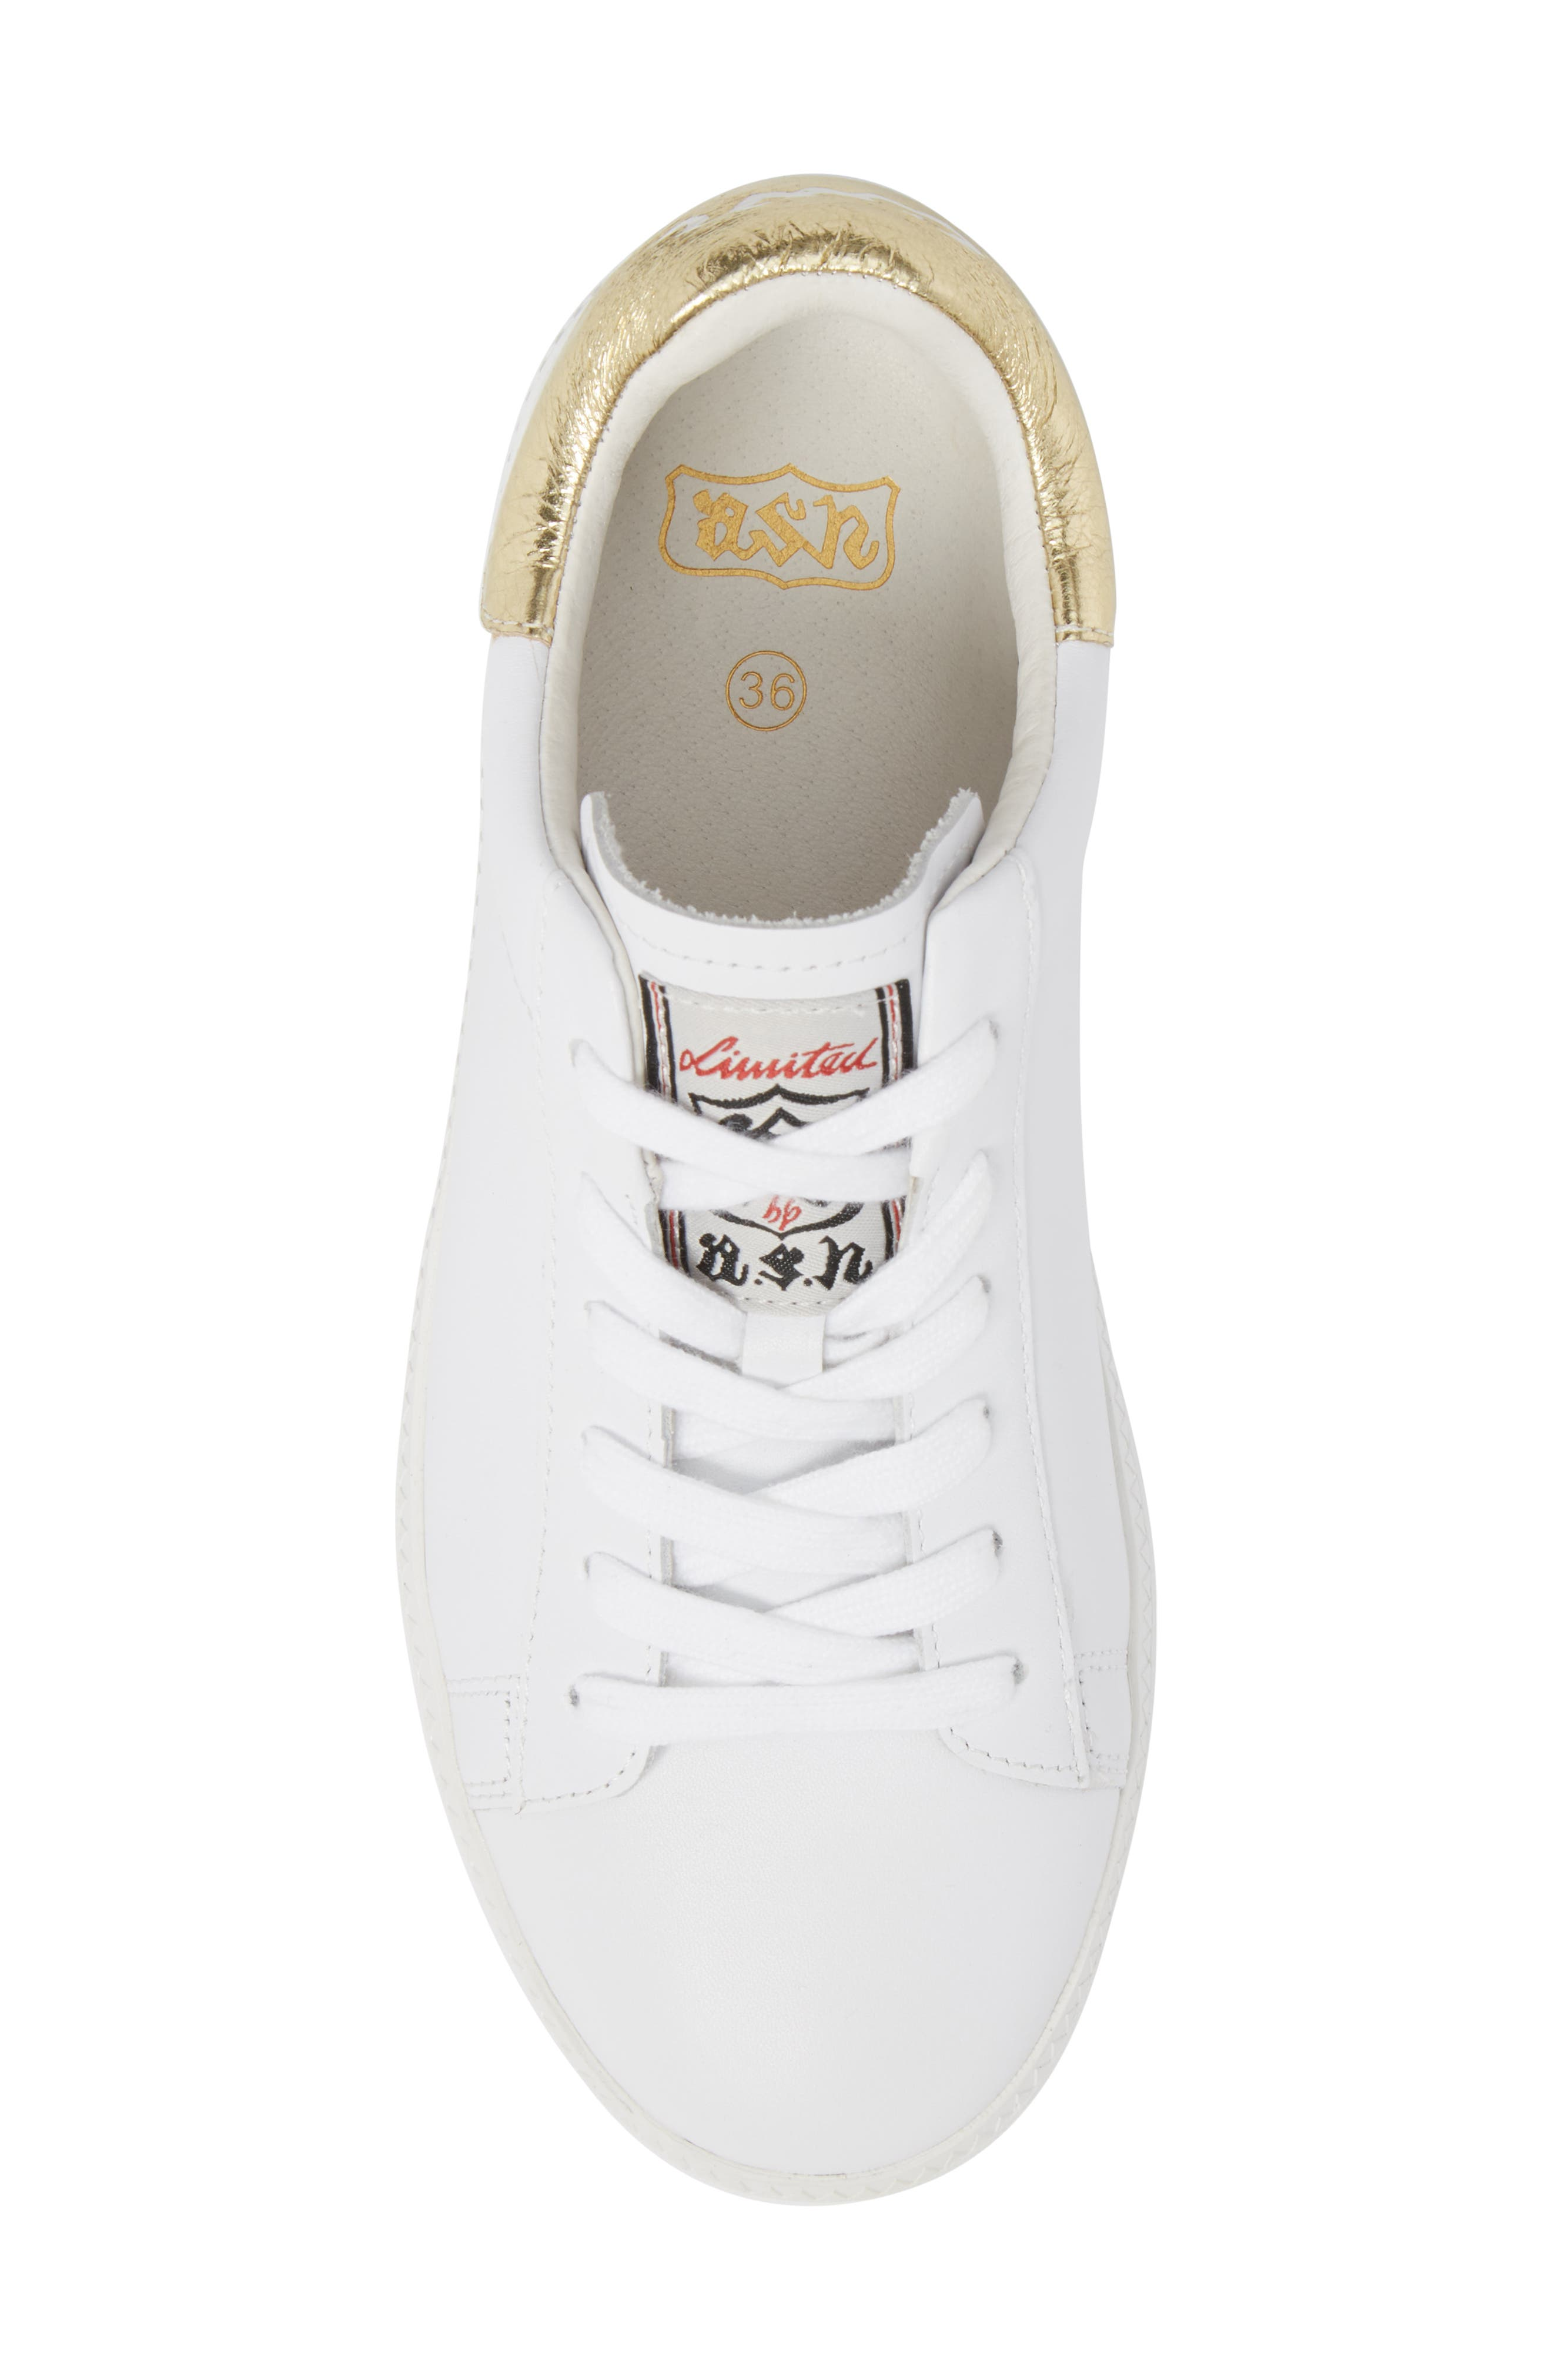 Cult Platform Sneaker,                             Alternate thumbnail 5, color,                             White/ Ariel